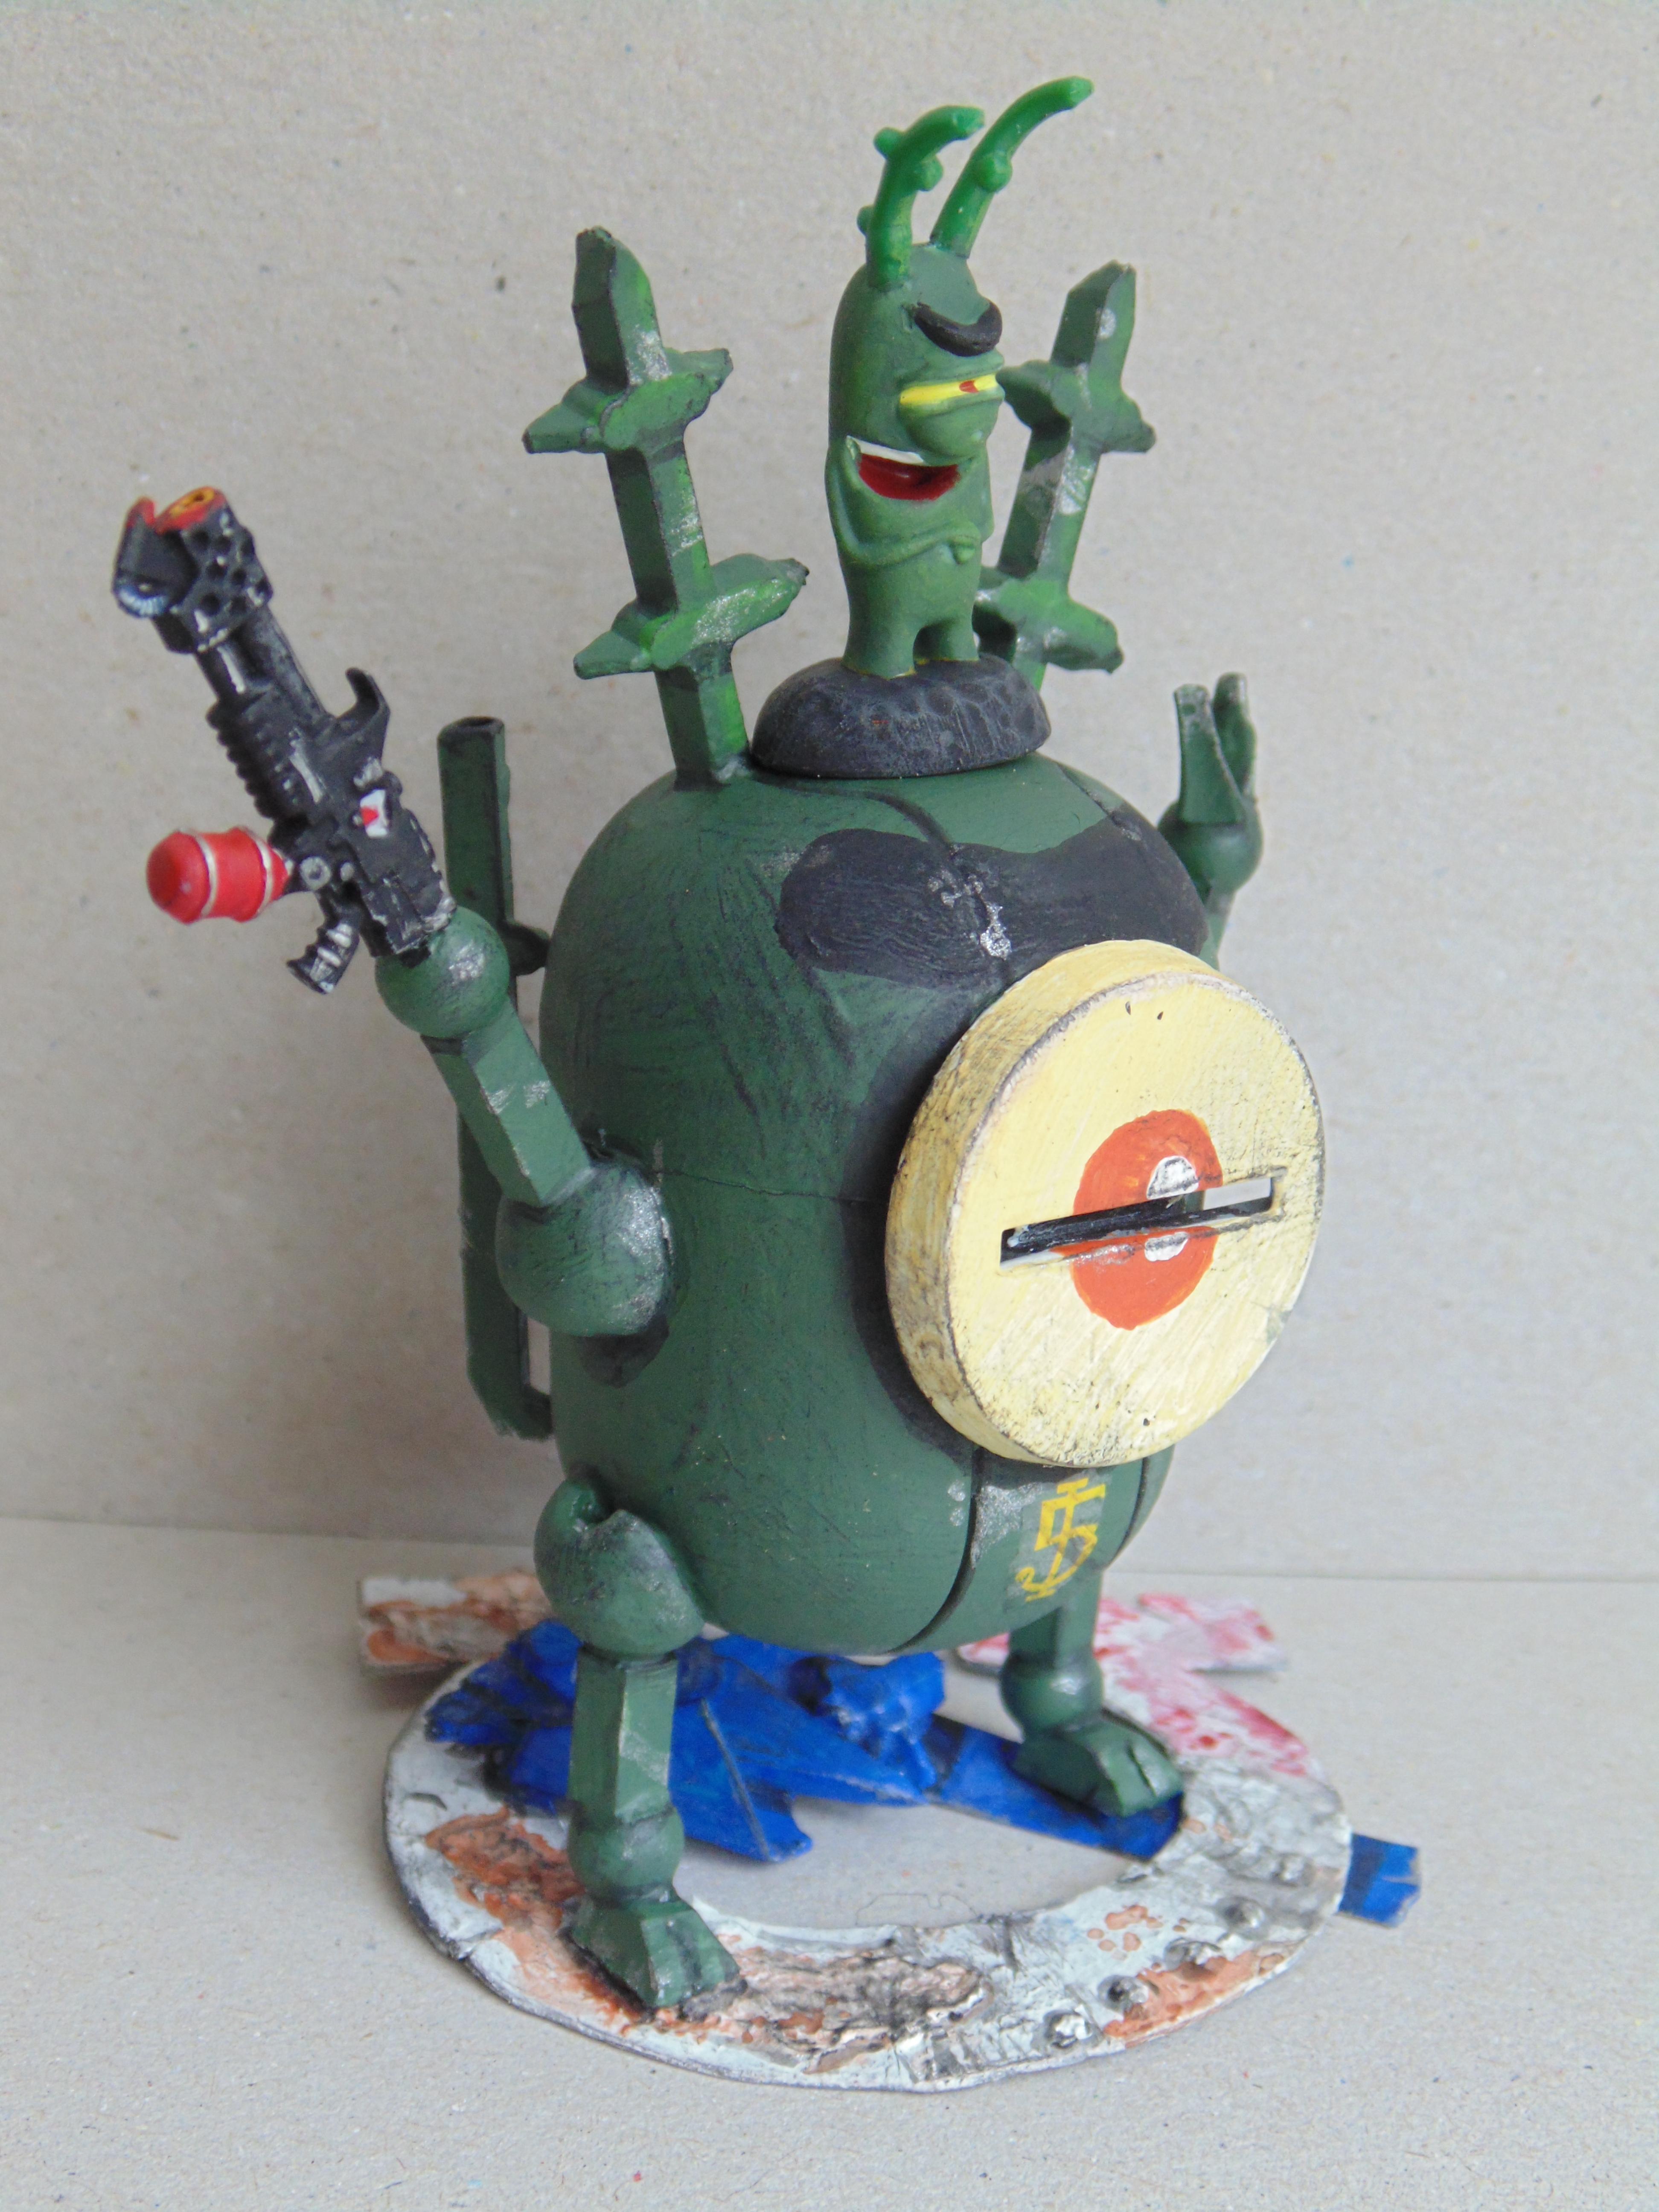 Bob, Conversion, Dreadnought, Fun, Humor, Imperial, Ogres, Ogryns, Plankton, Sponge